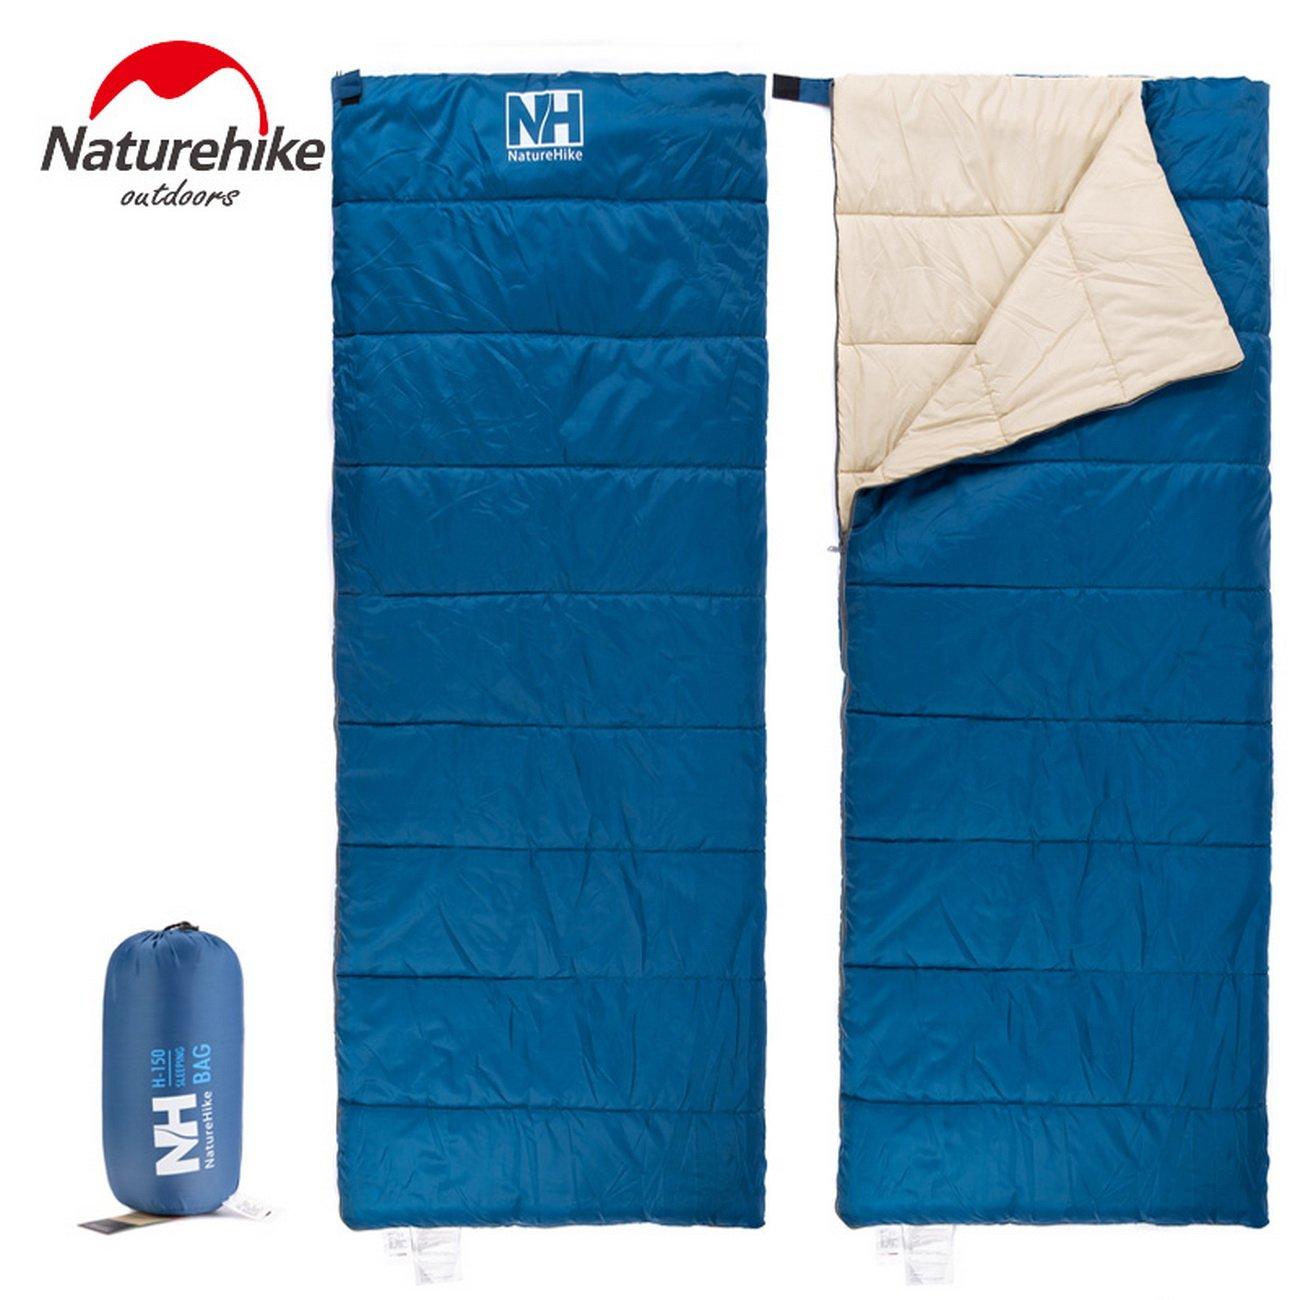 Naturehike Ultralight móviles de Sobre algodón Saco de Dormir nh15 a150 de D: Amazon.es: Hogar